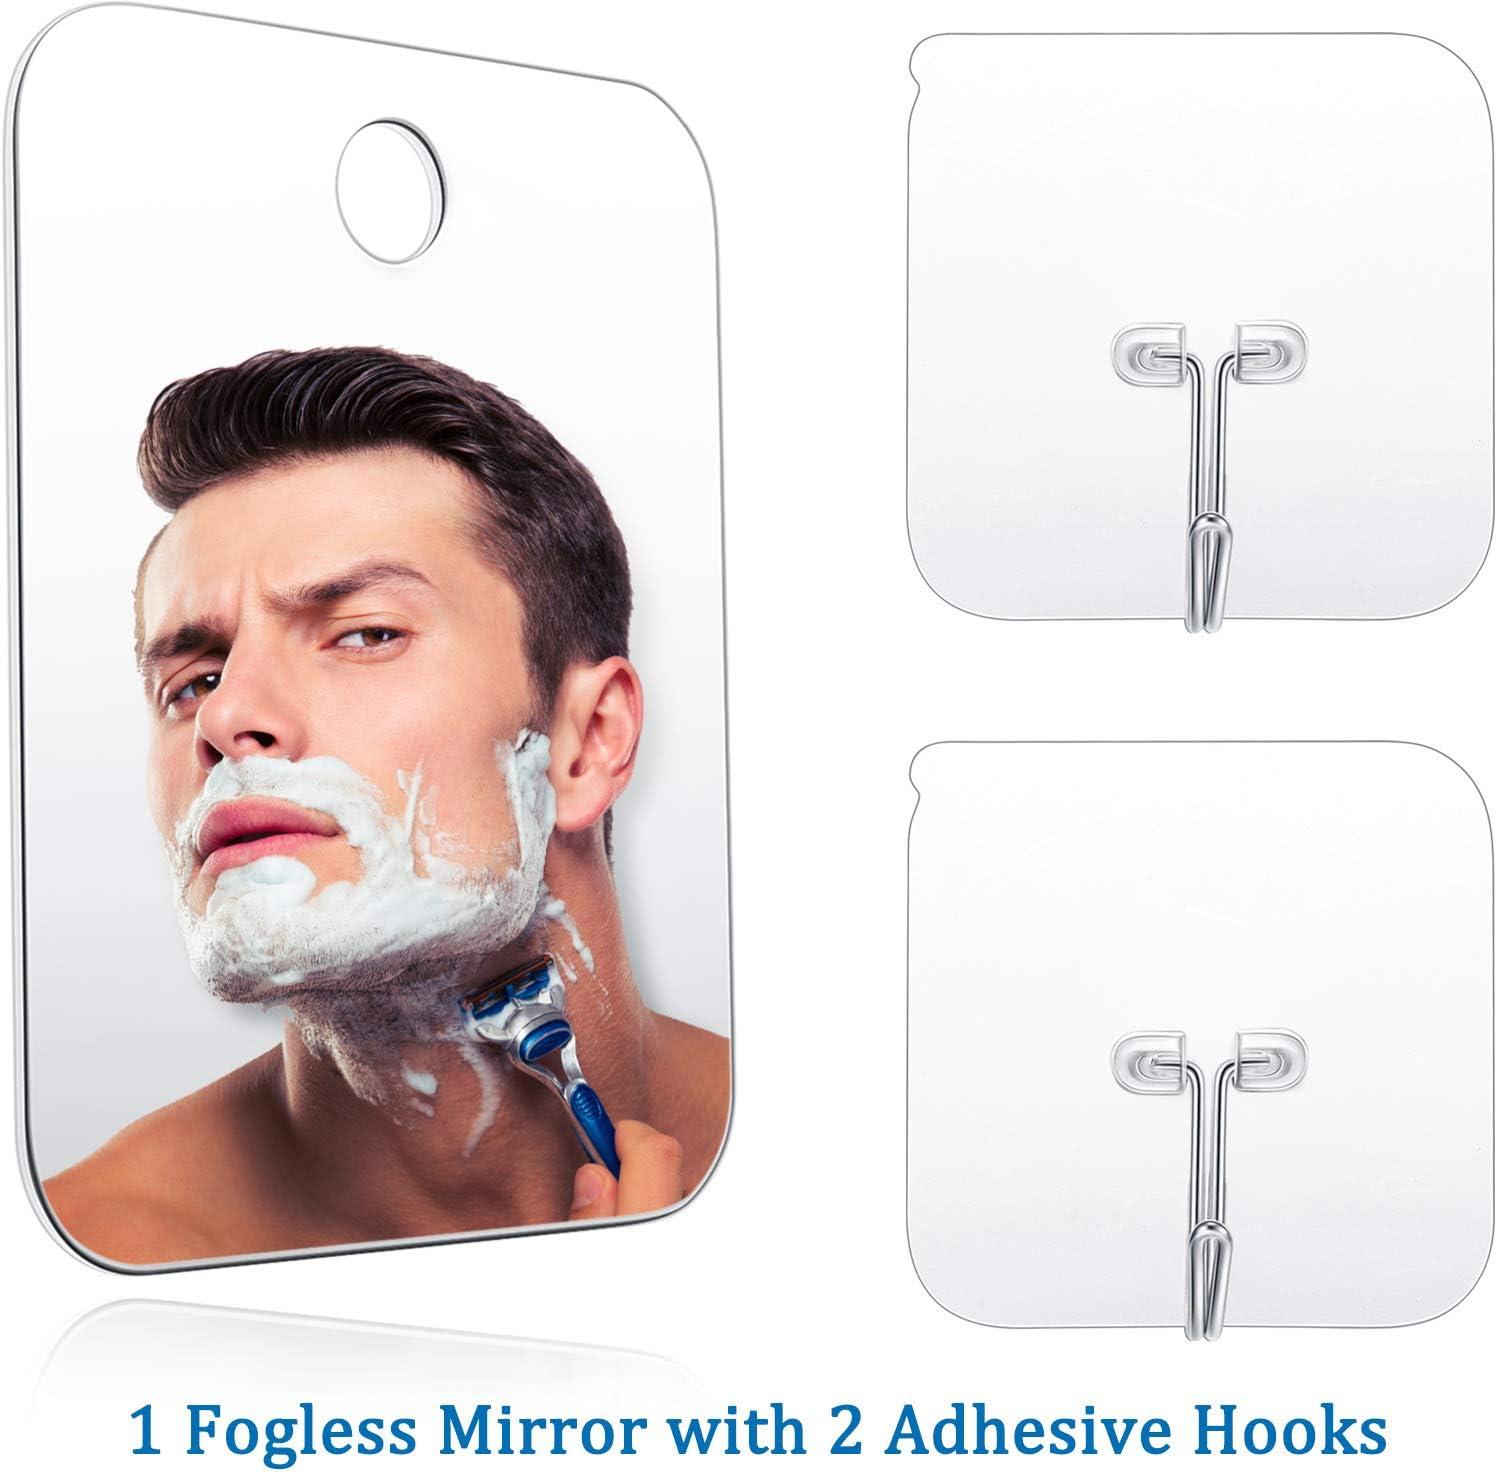 Espejo de Ducha Espejo Ativaho Maquillaje de Afeitar Espejo Ligero sin Marco con 2 Ganchos Pegajosos, 6.8 x 5.2 Pulgadas